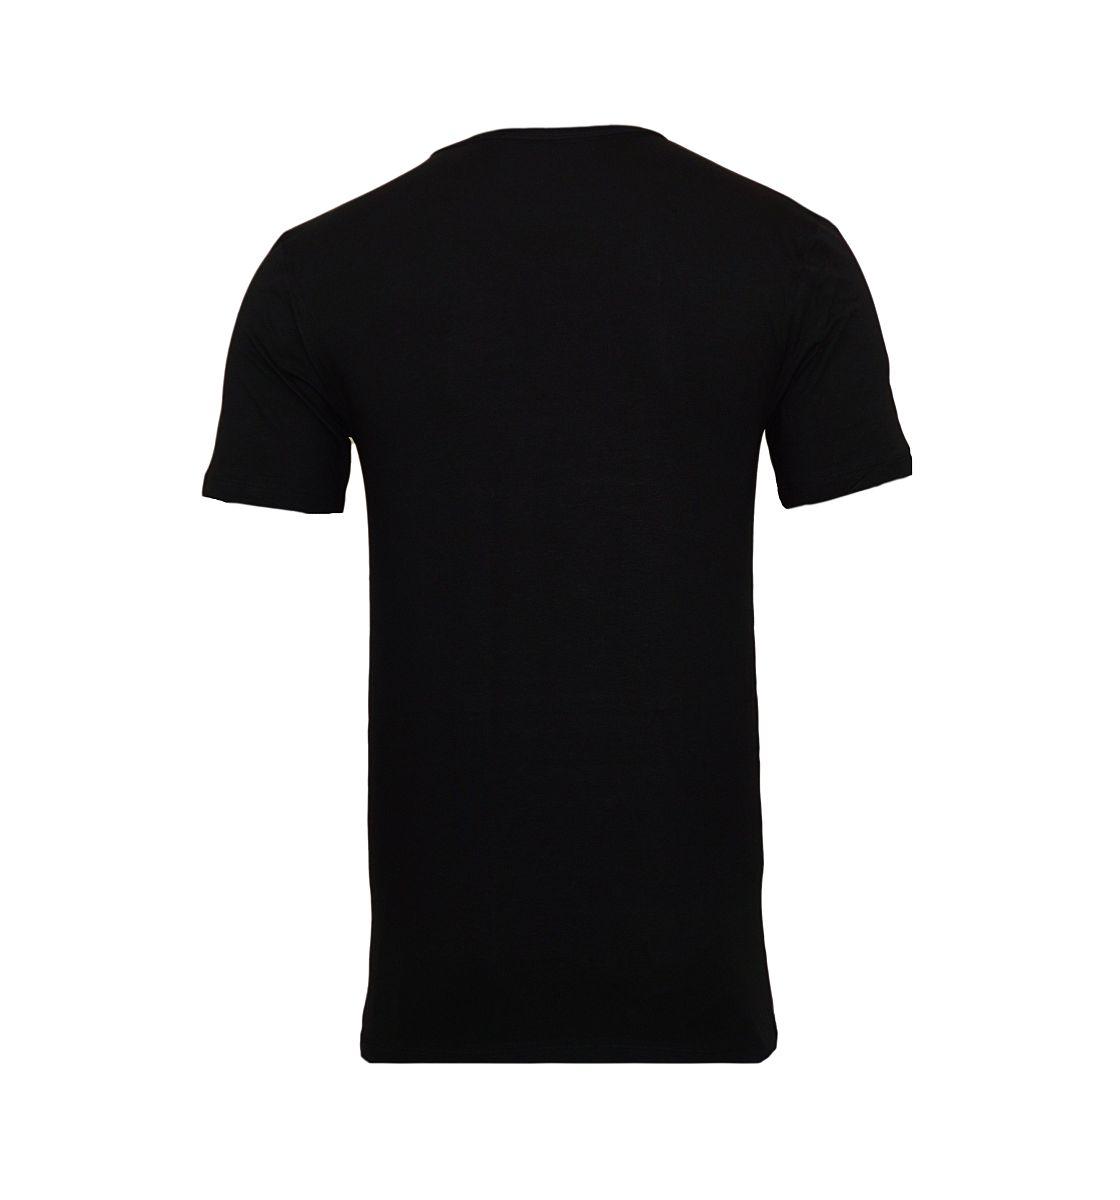 Baldessarini 2er Pack T-Shirts Kurzarm 90005 6061 9009 jet black W18-BST1